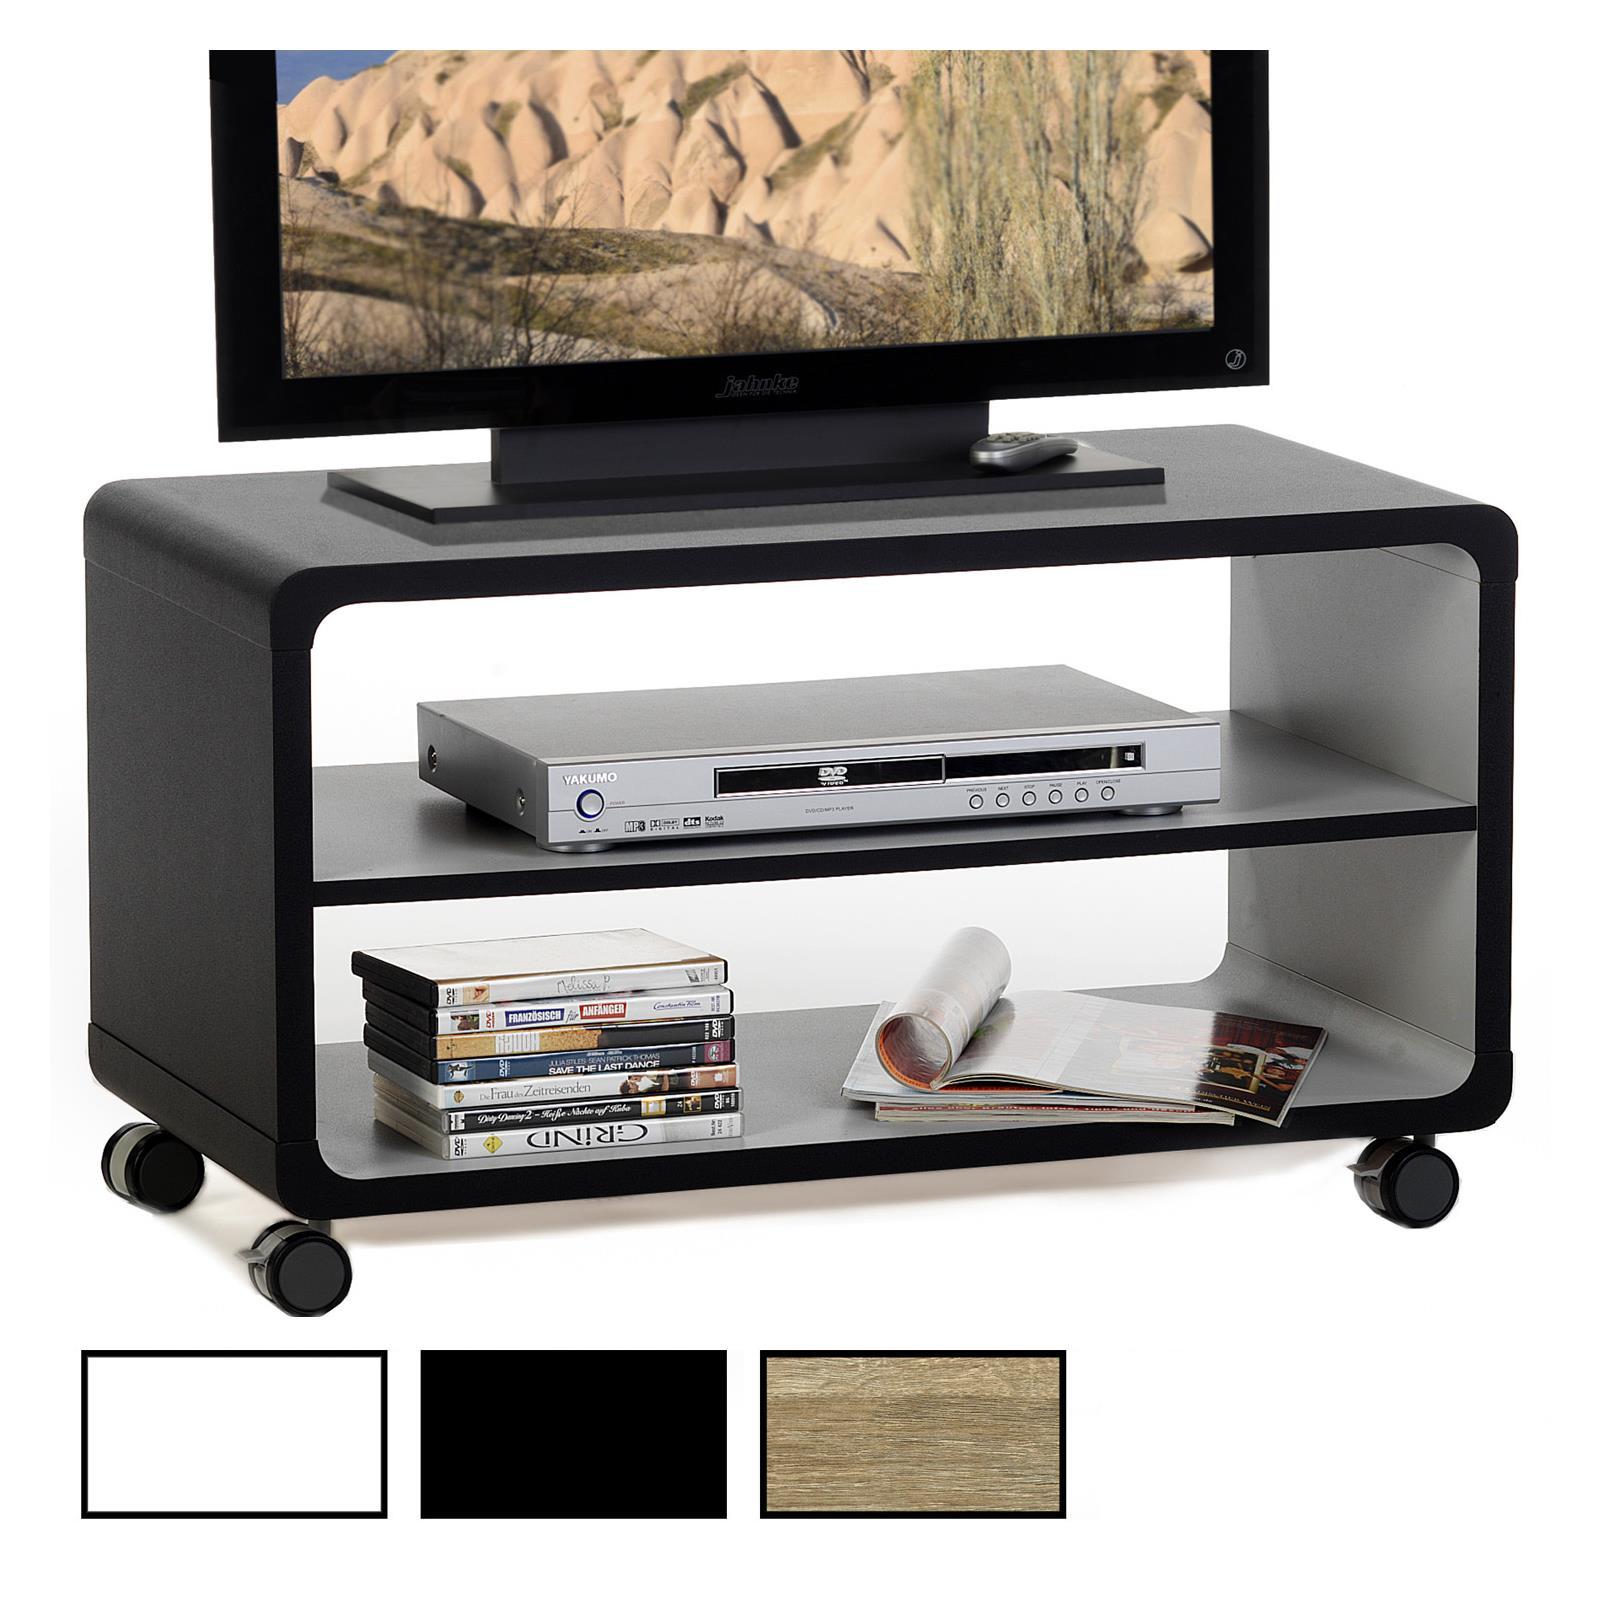 tv rack miami in versch farbvarianten mobilia24. Black Bedroom Furniture Sets. Home Design Ideas